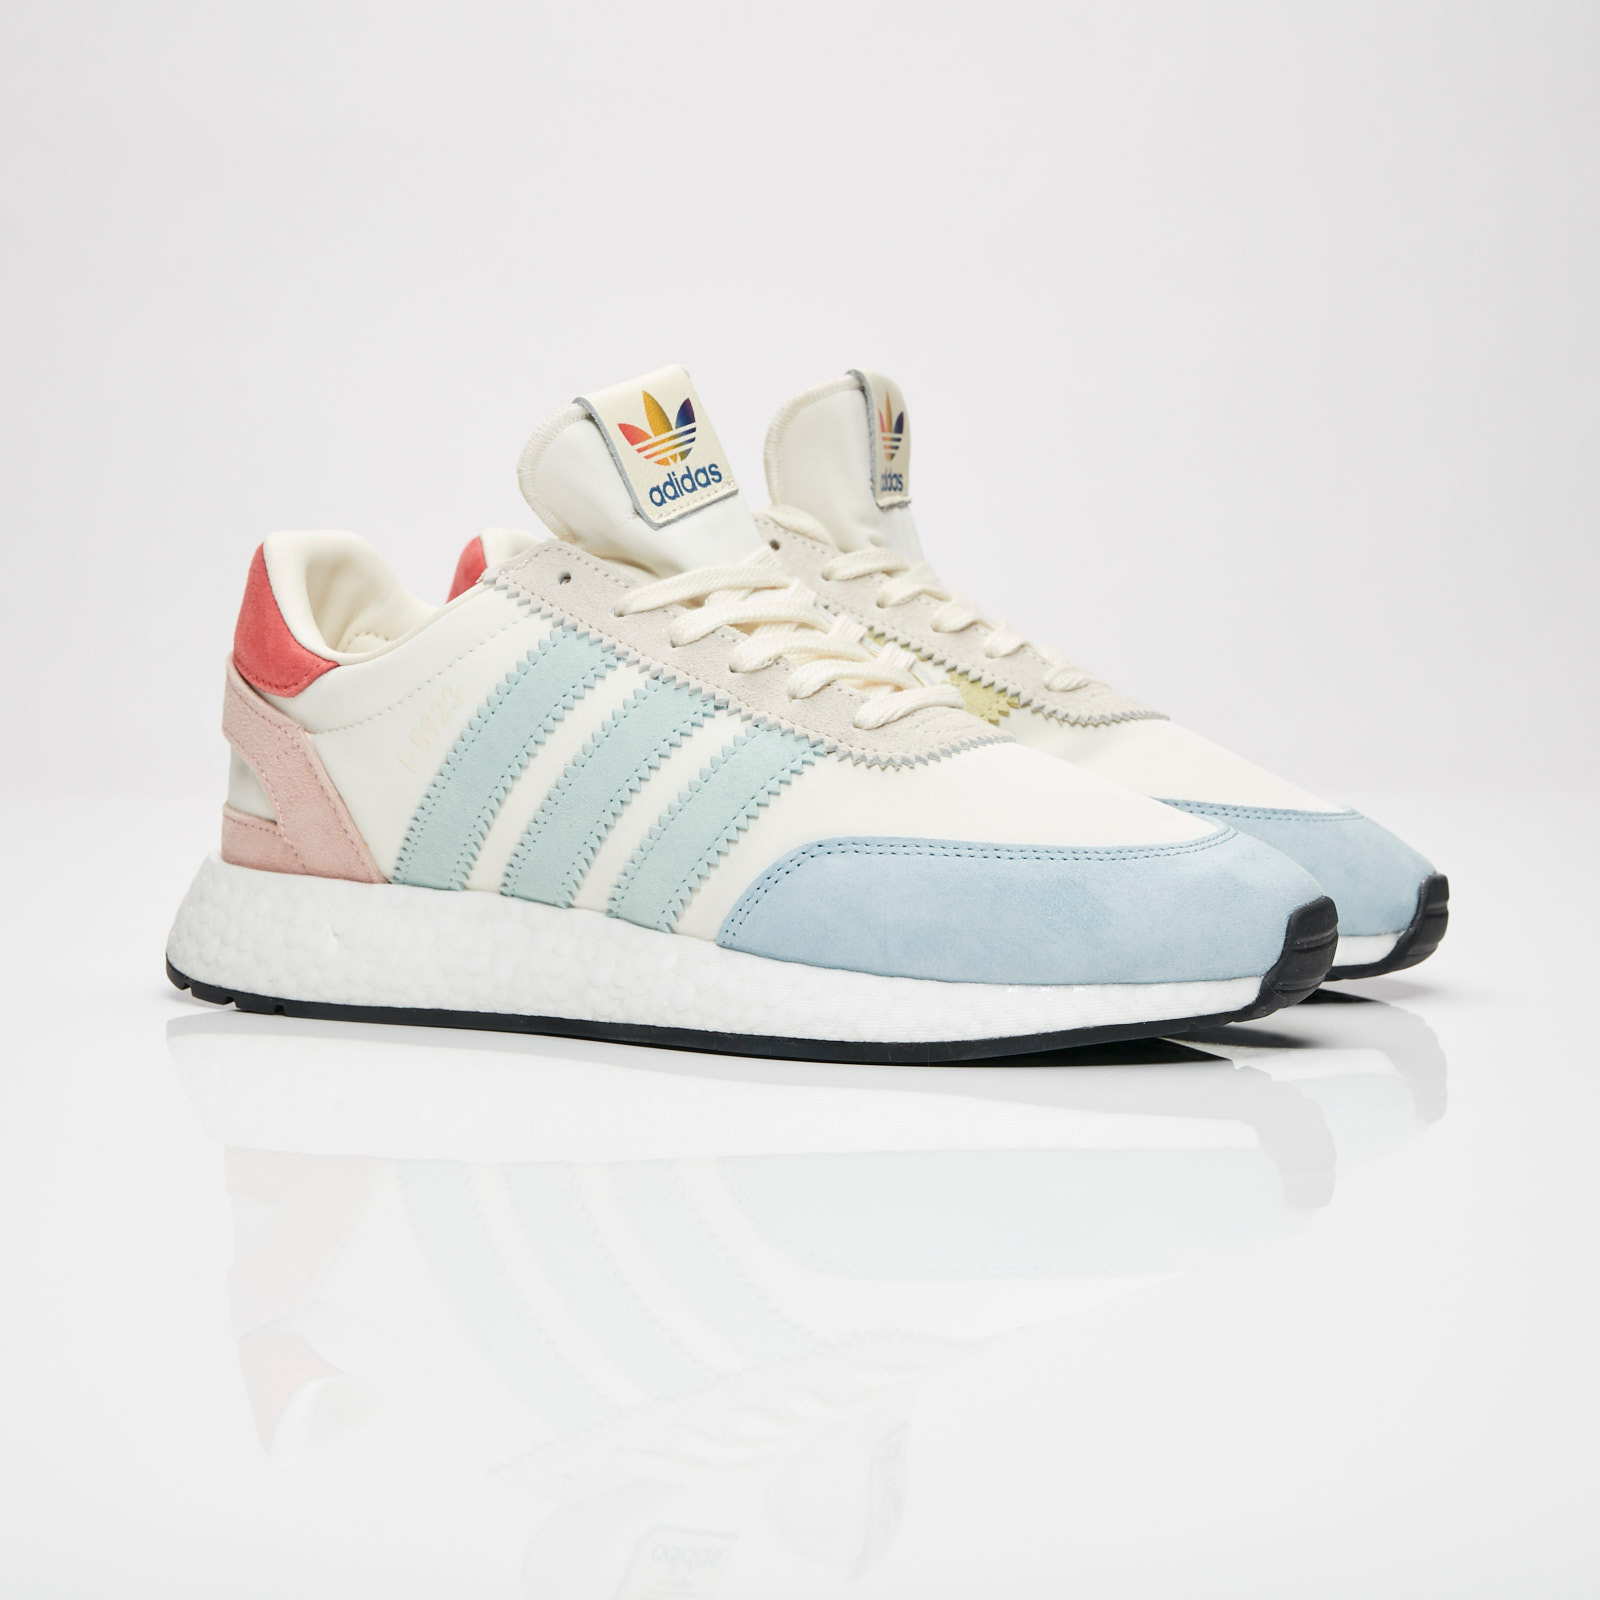 adidas I-5923 - B41984 - Sneakersnstuff